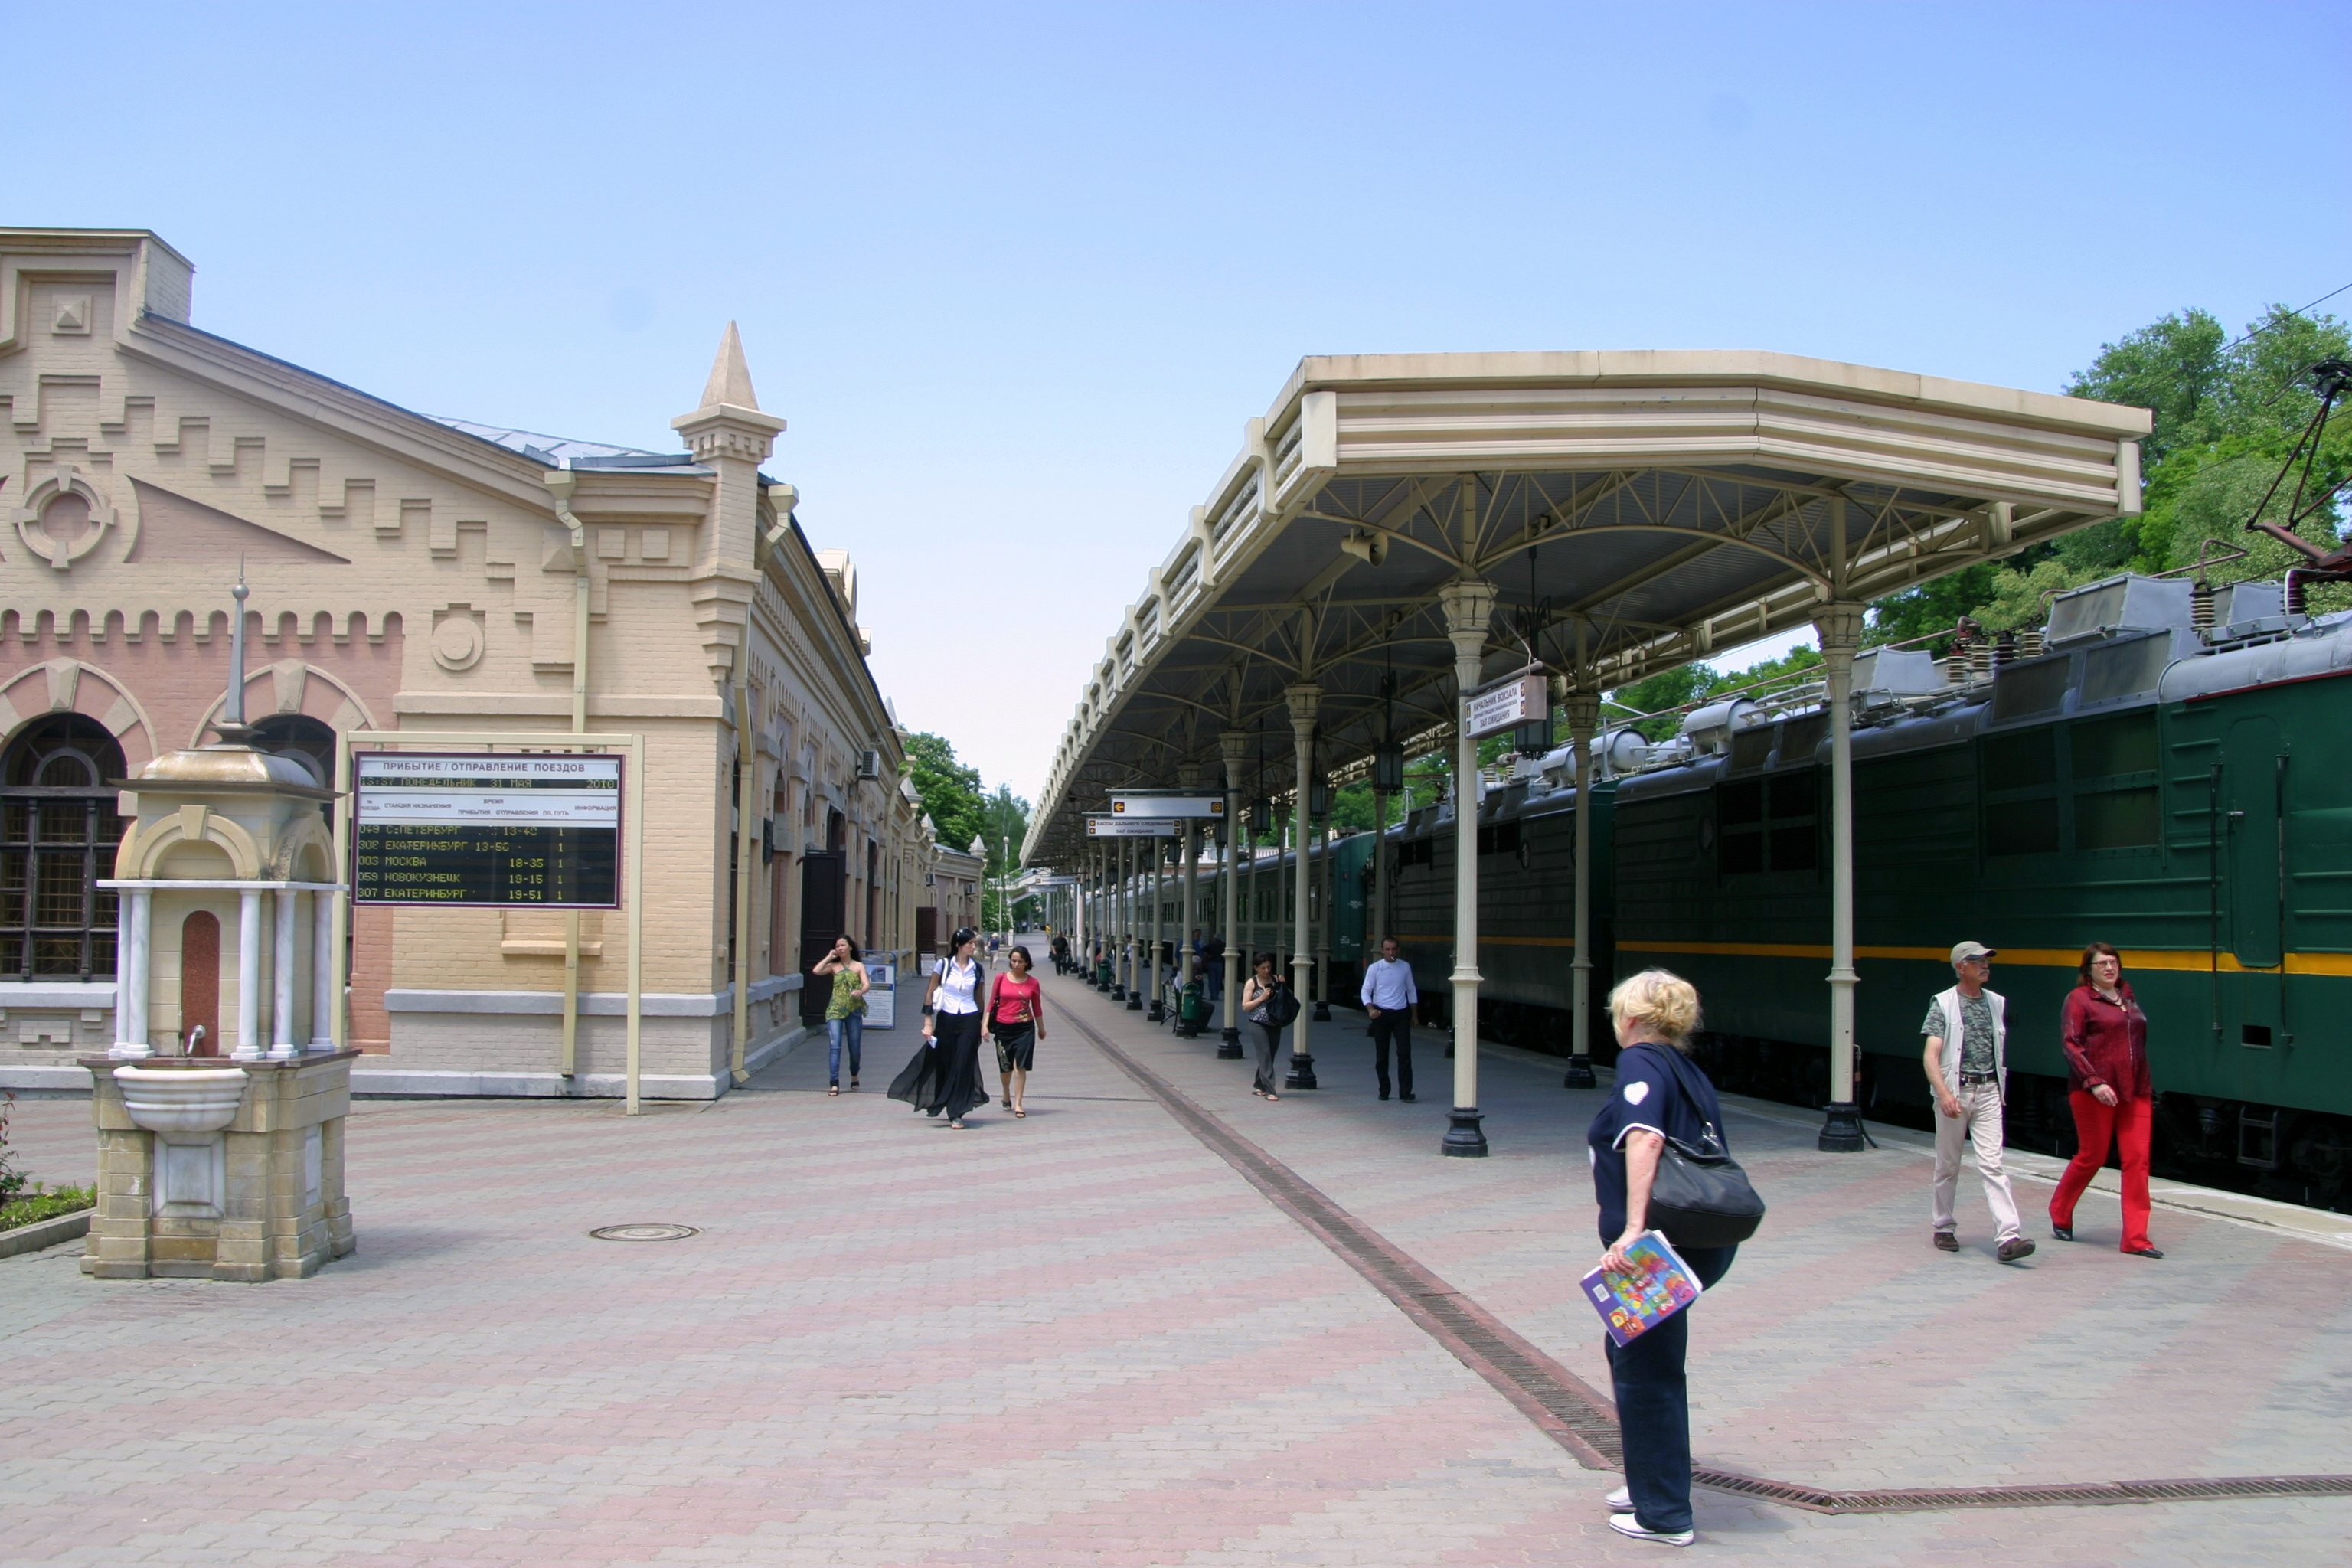 Картинки по запросу кисловодск жд вокзал